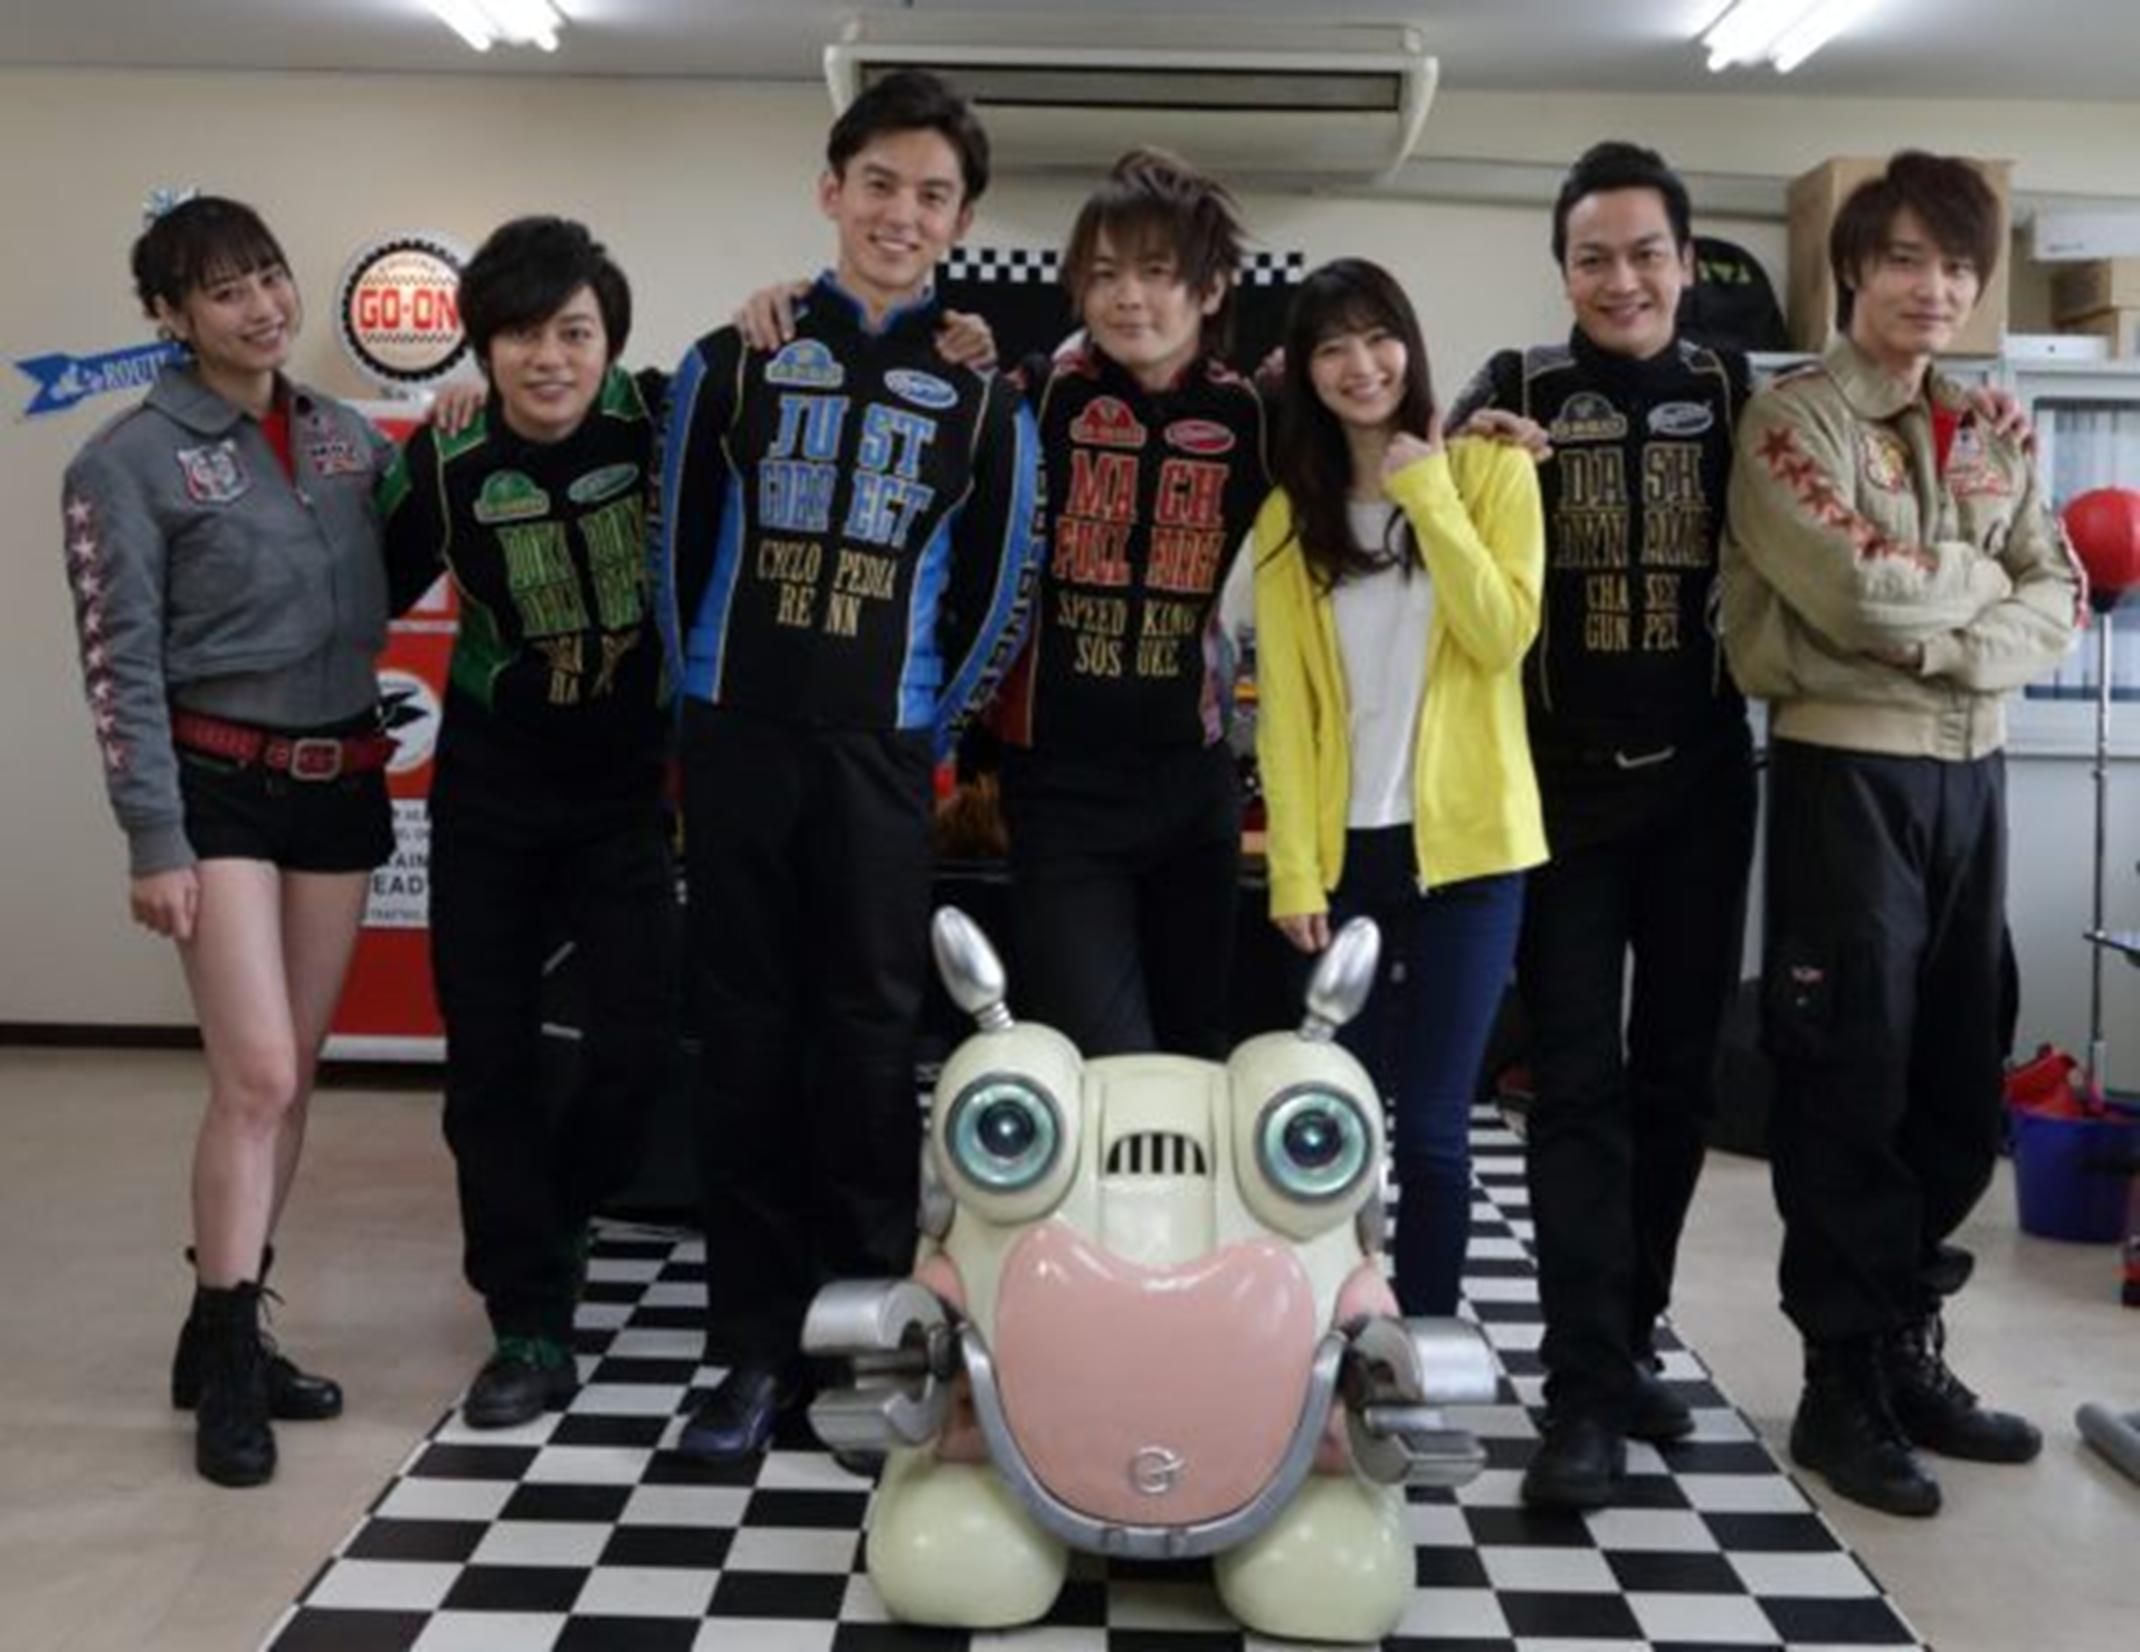 Engine Sentai Go Onger 10 Years Grand Prix Cast Photo